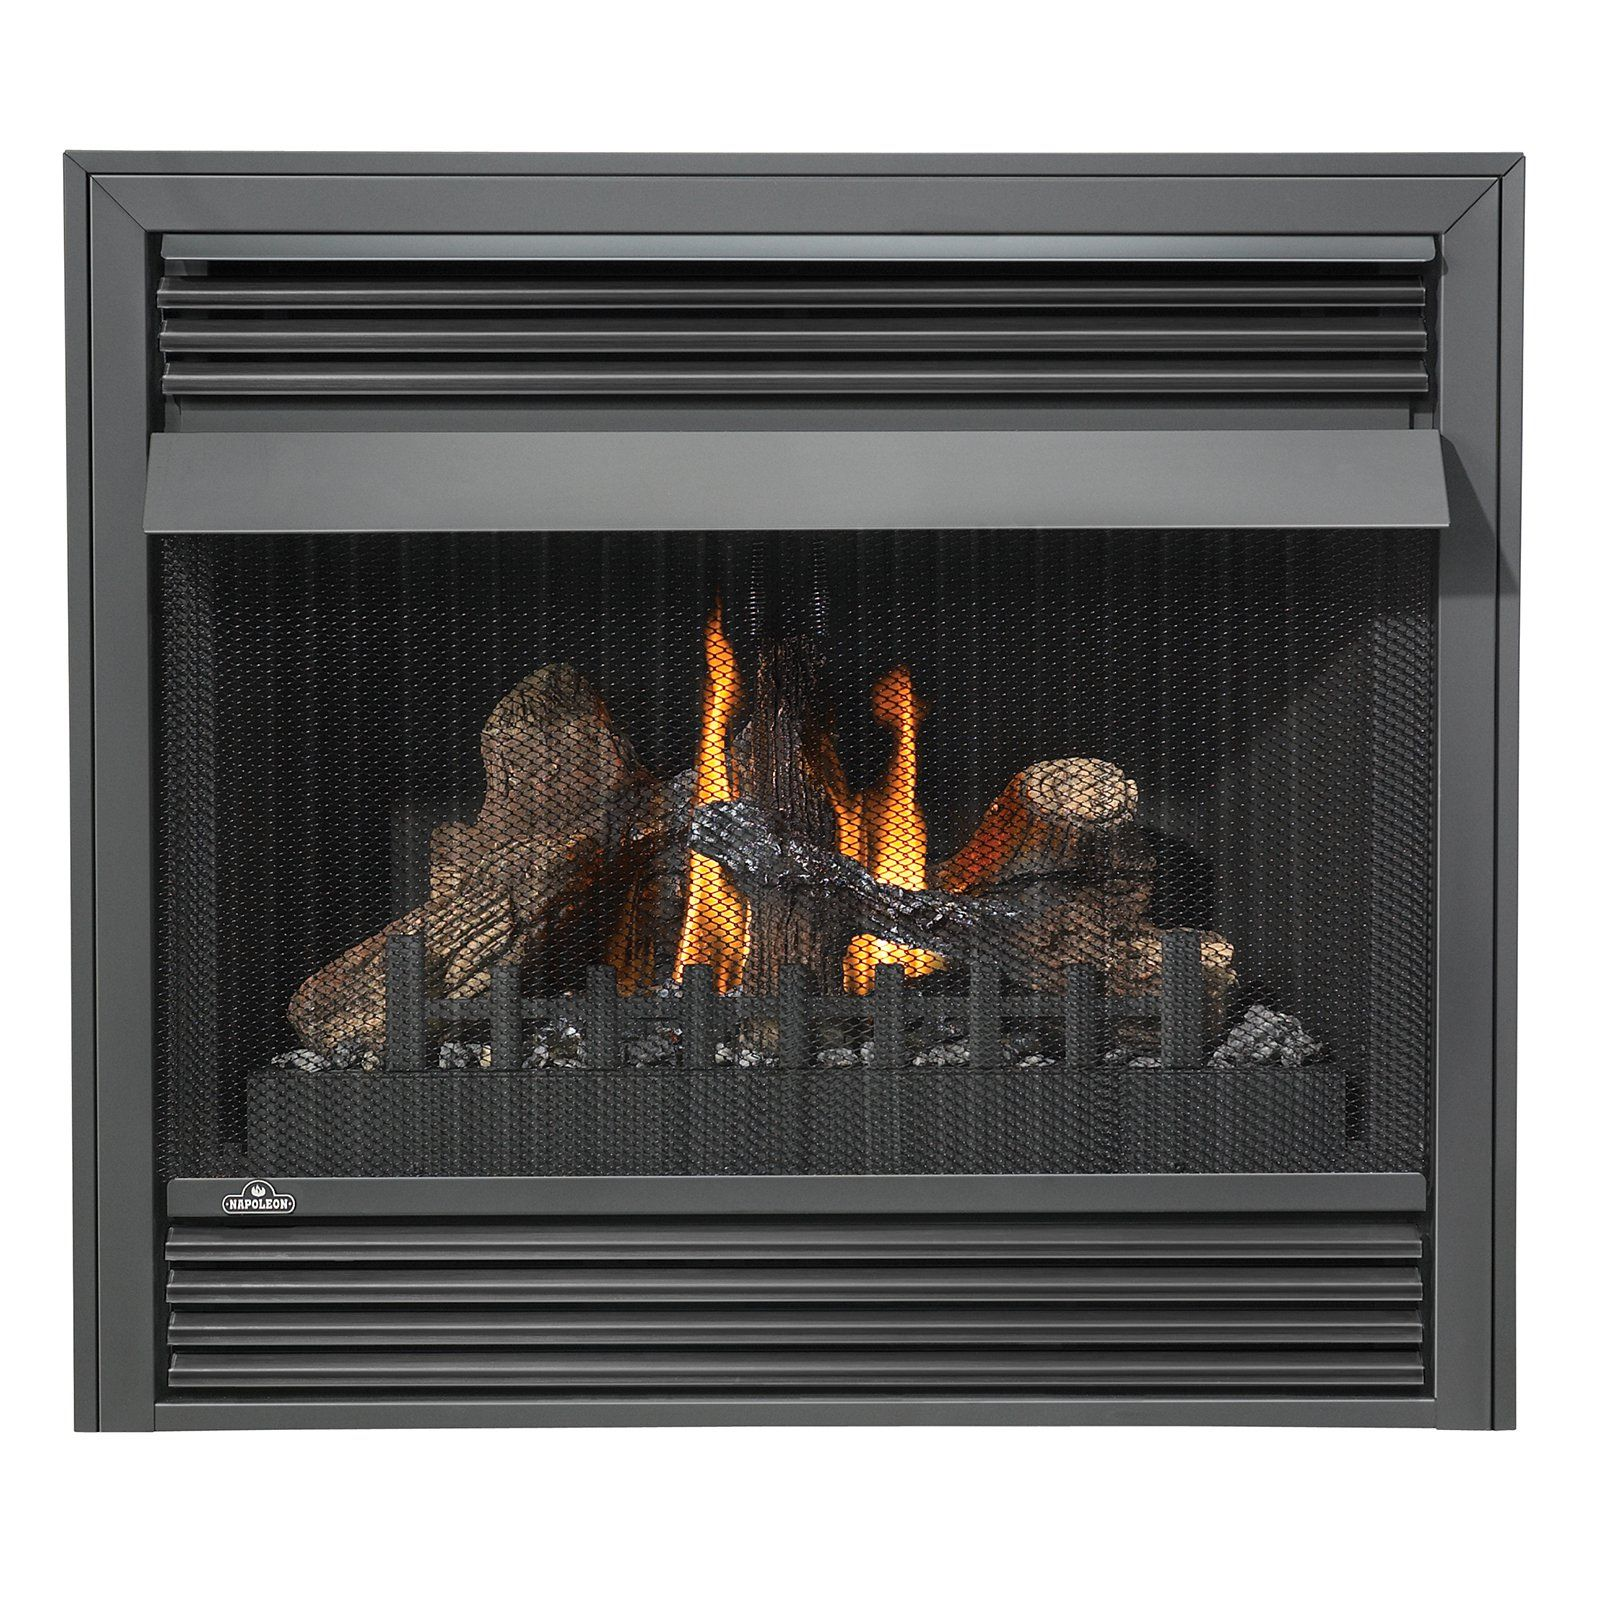 Napoleon GVF36N Vent Free Fireplace Propane fireplace